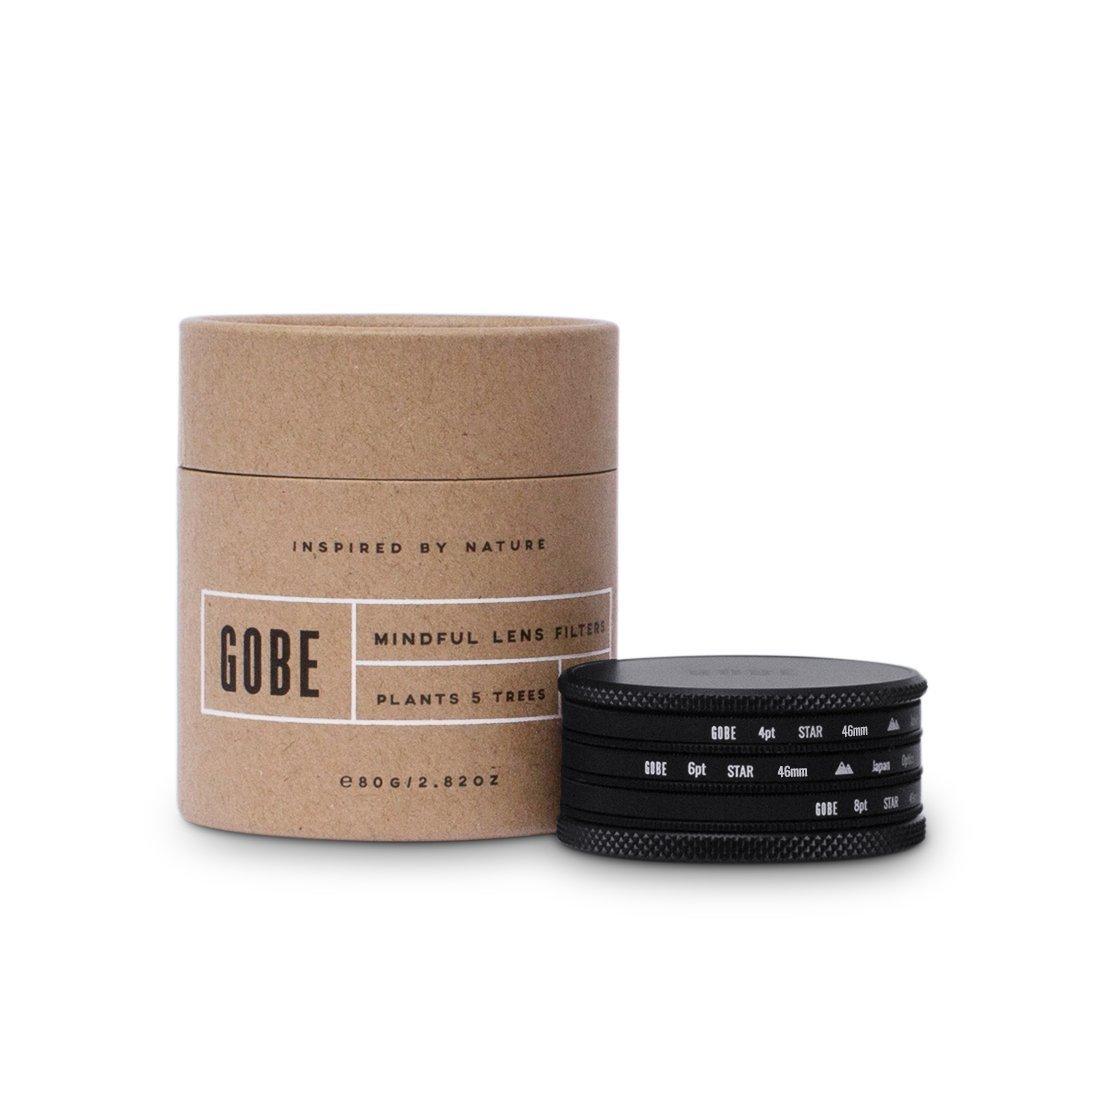 Gobe Star Filter Kit 46mm: 4 Points, 6 Points, 8 Points by Gobe